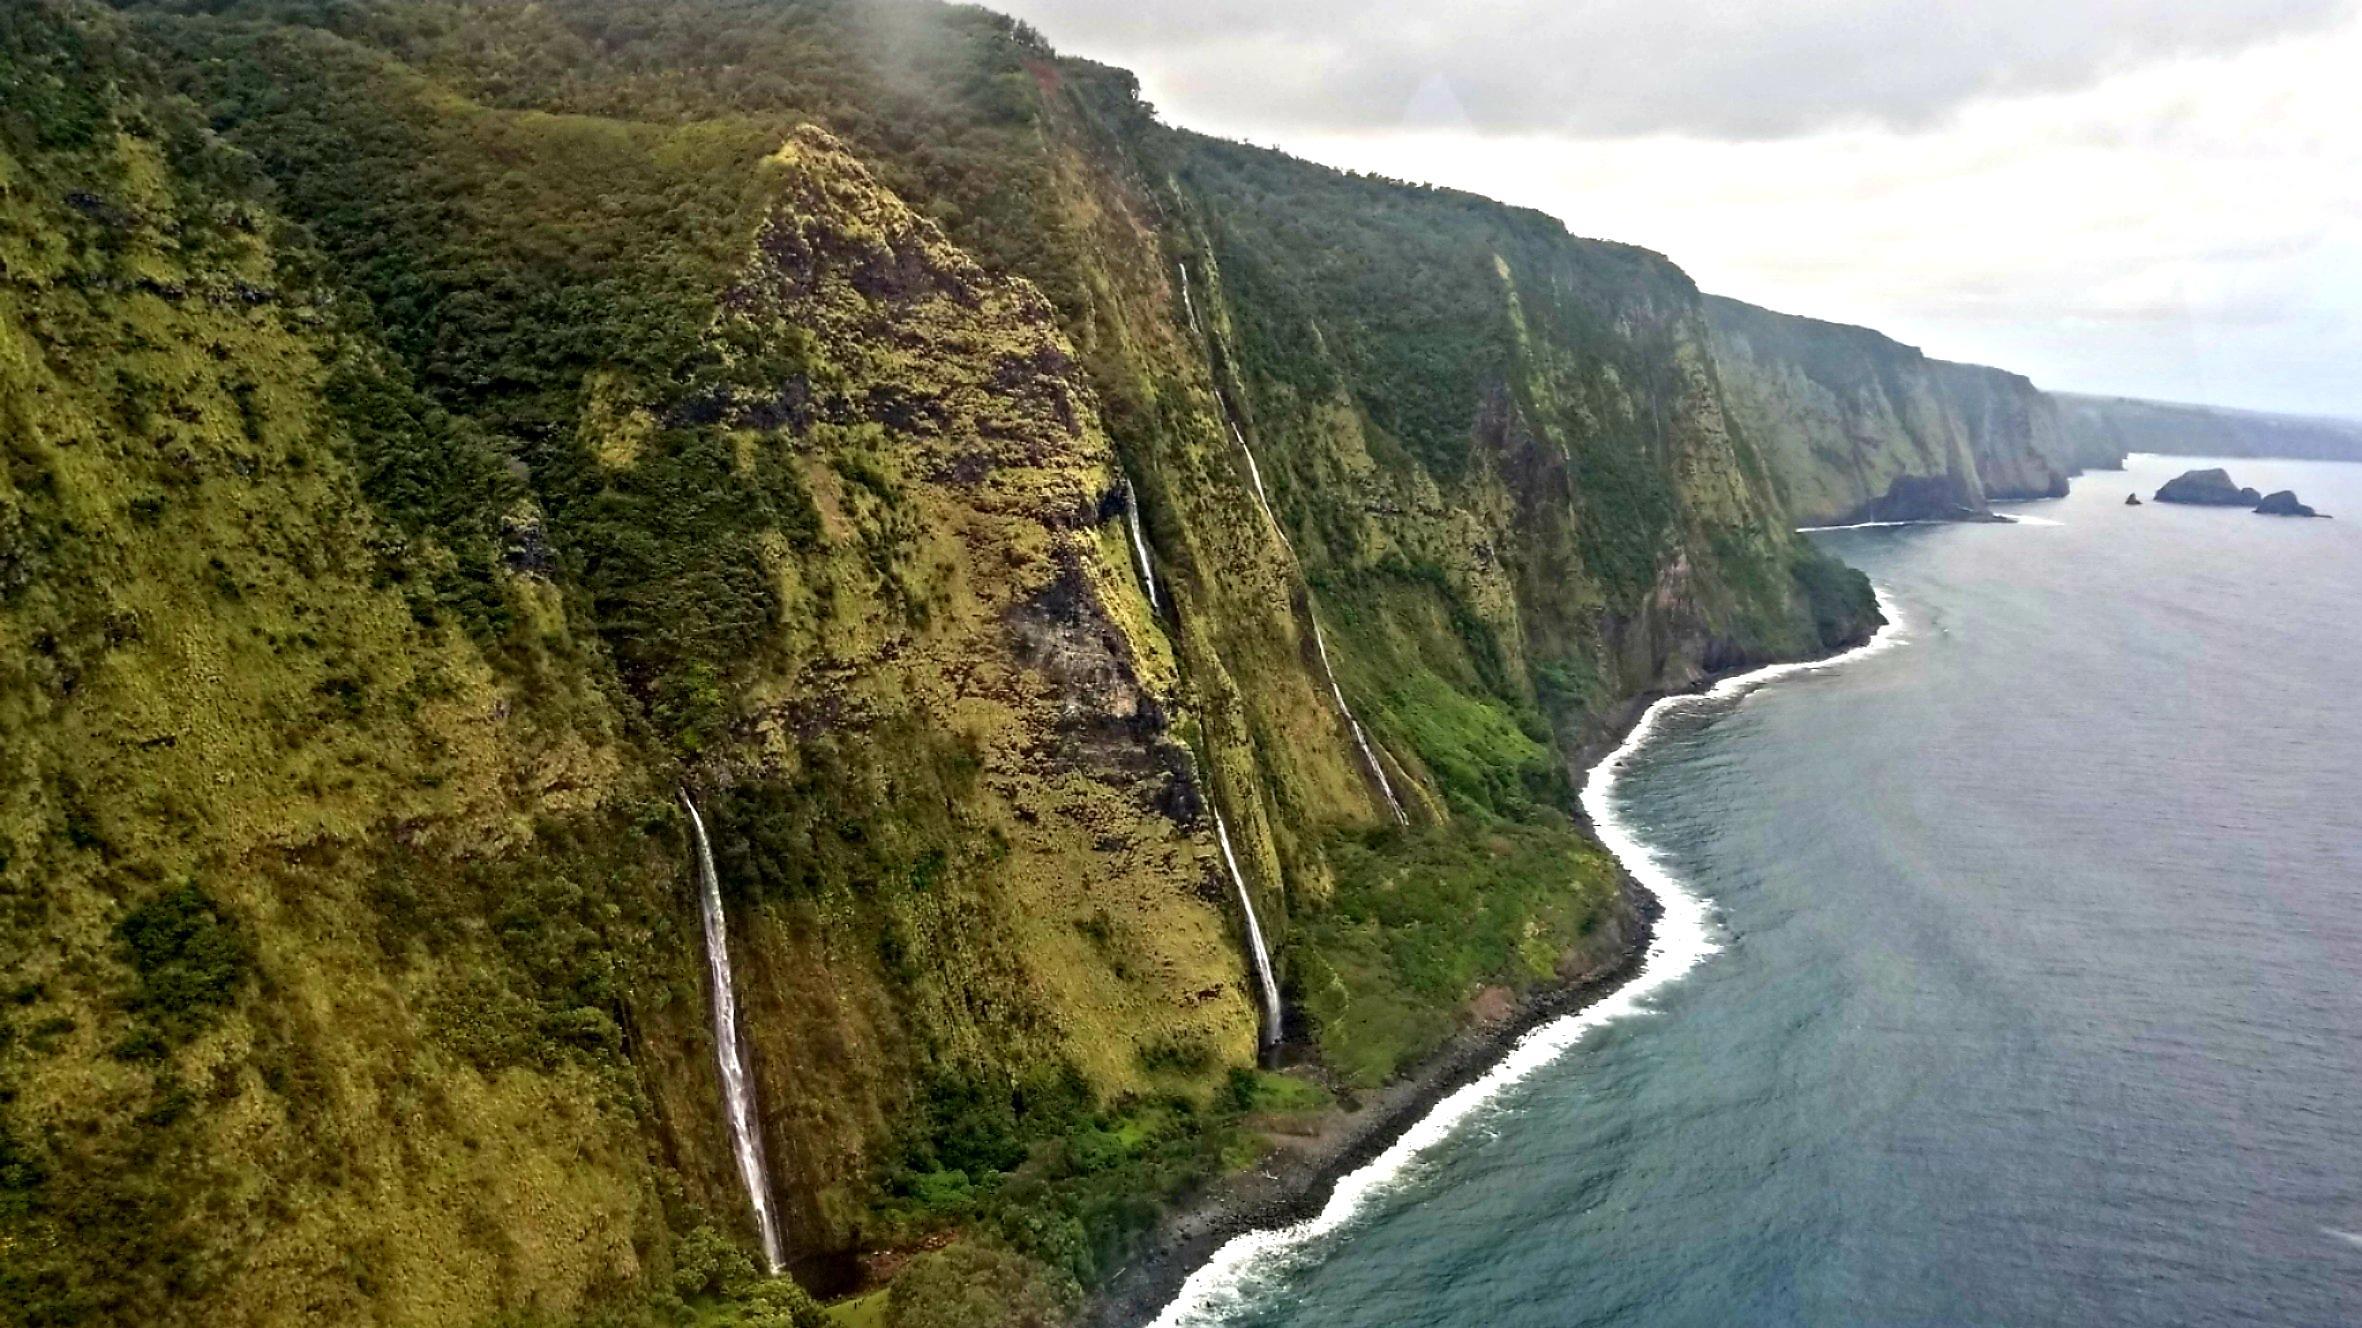 Waterton Lakes National Park Canada Cameron Falls Wallpaper The Big Island Of Hawaii 2362 215 1328 Oc Expose Nature